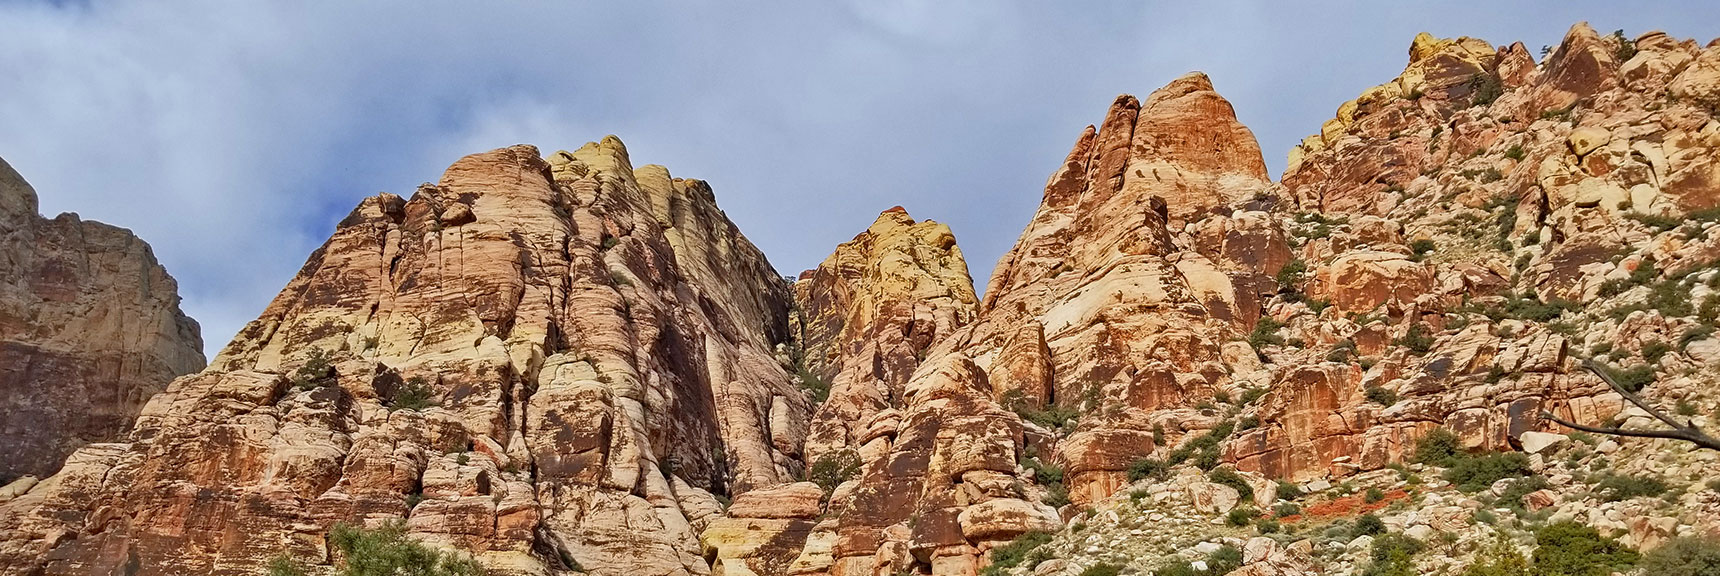 Juniper Peak, Rainbow Mountain Wilderness, Nevada